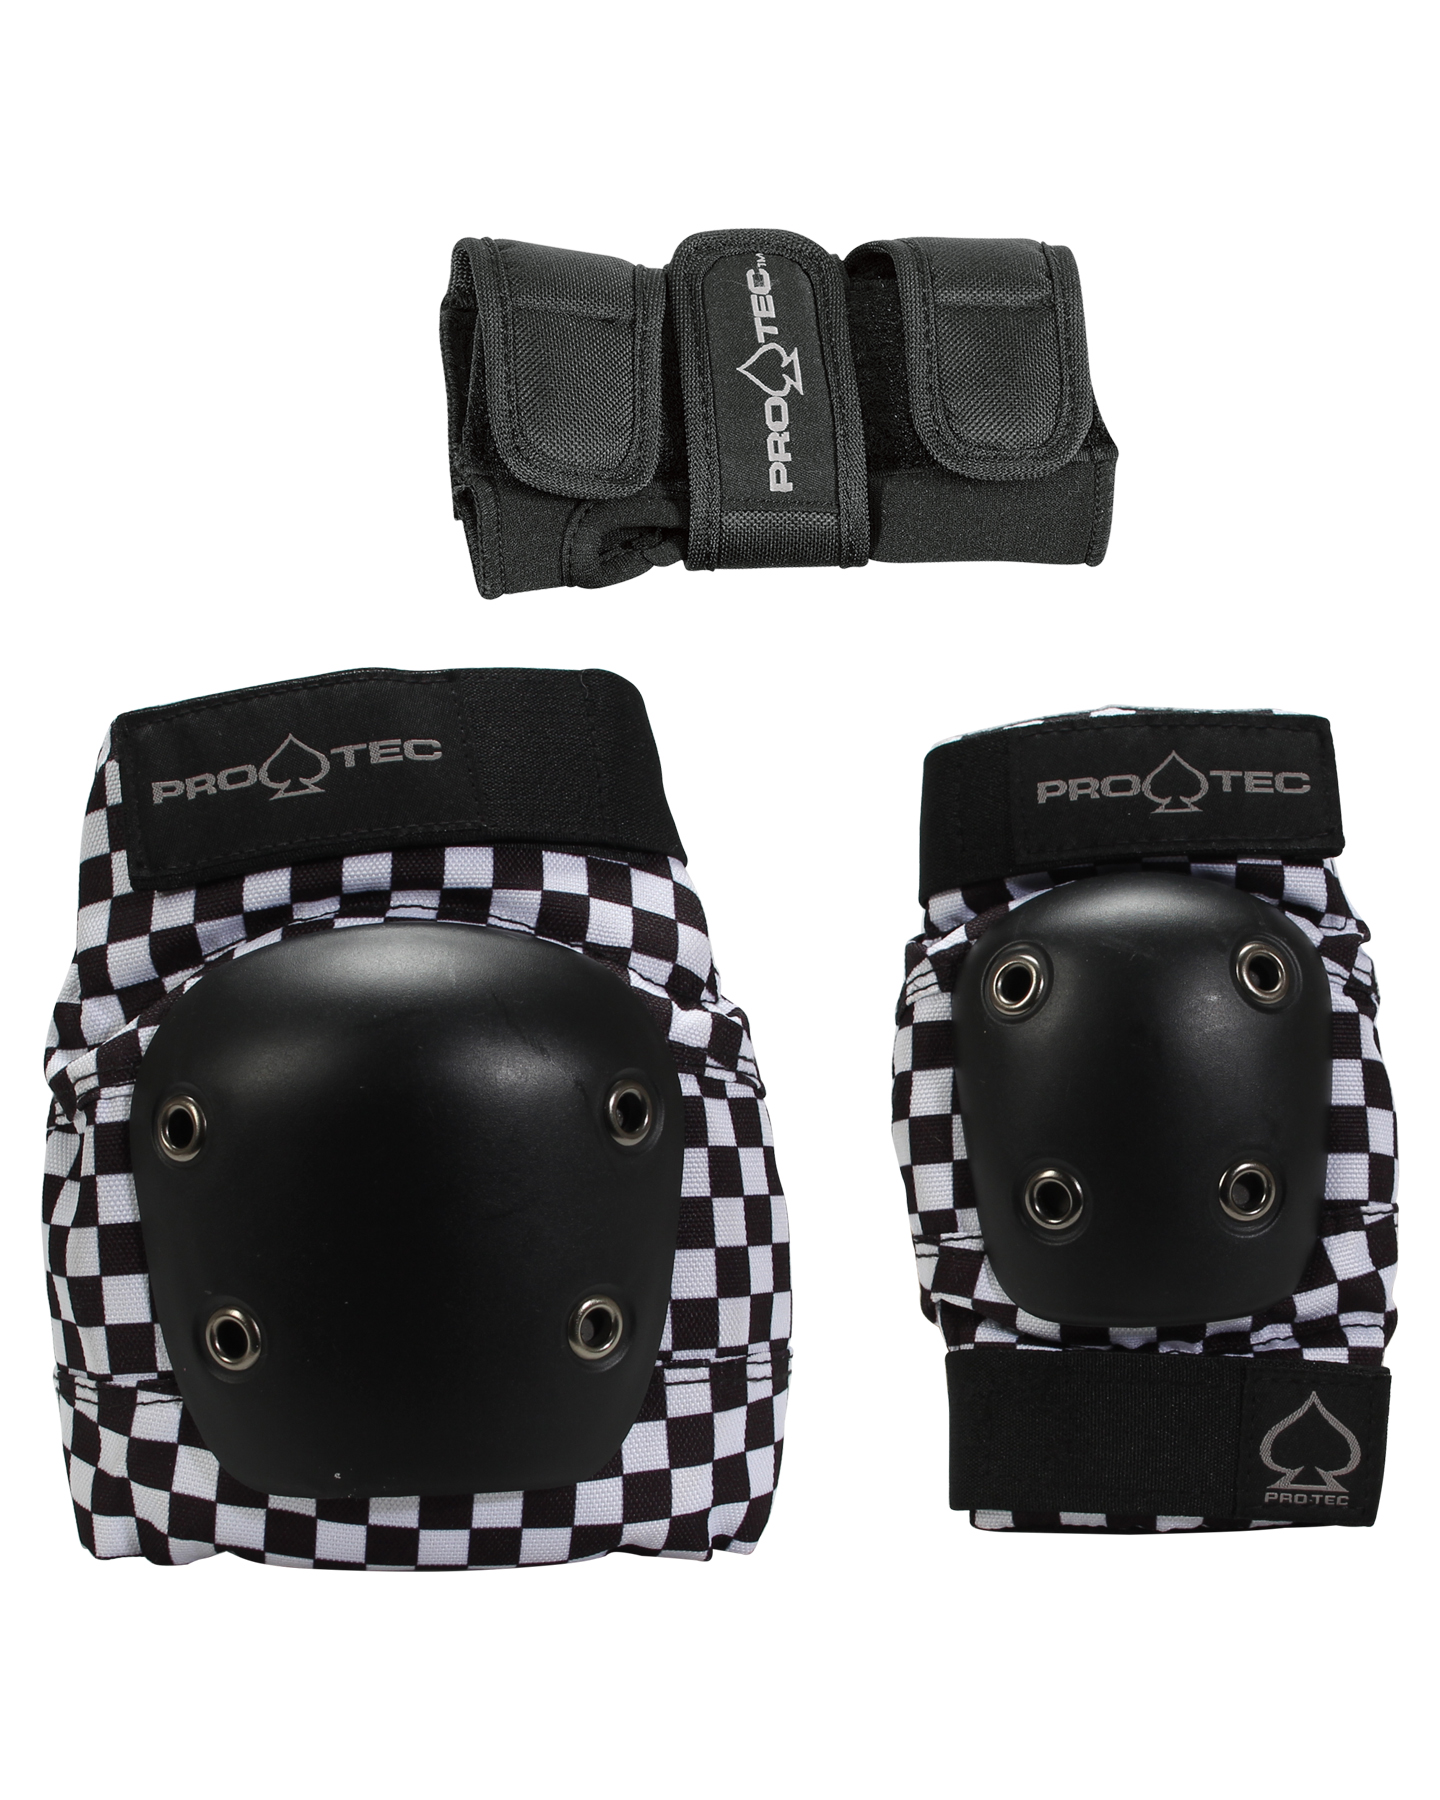 Protec Street Gear 3Pk Jnr Pads Checker